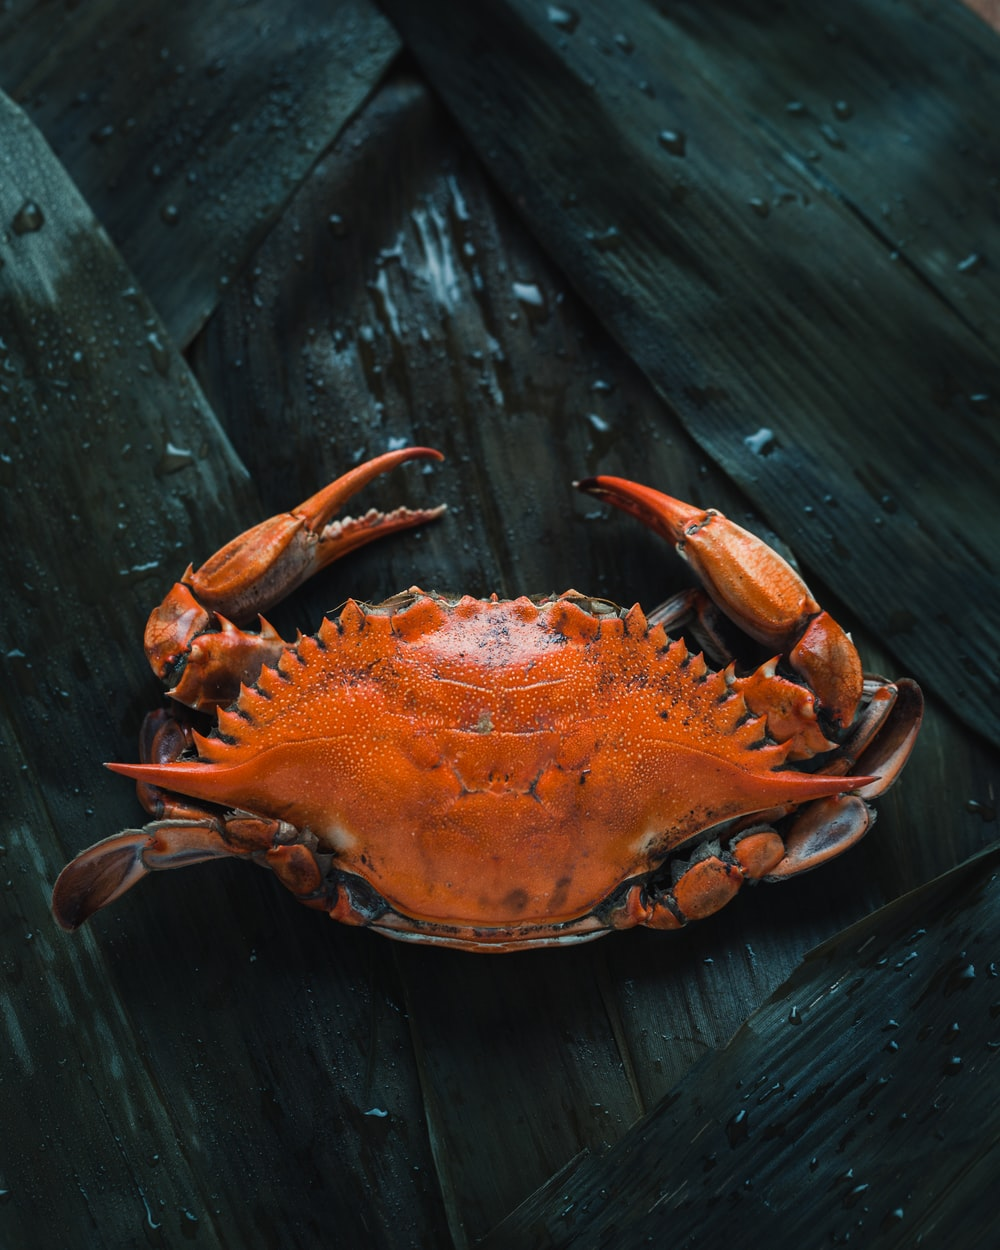 brown crab on brown surface